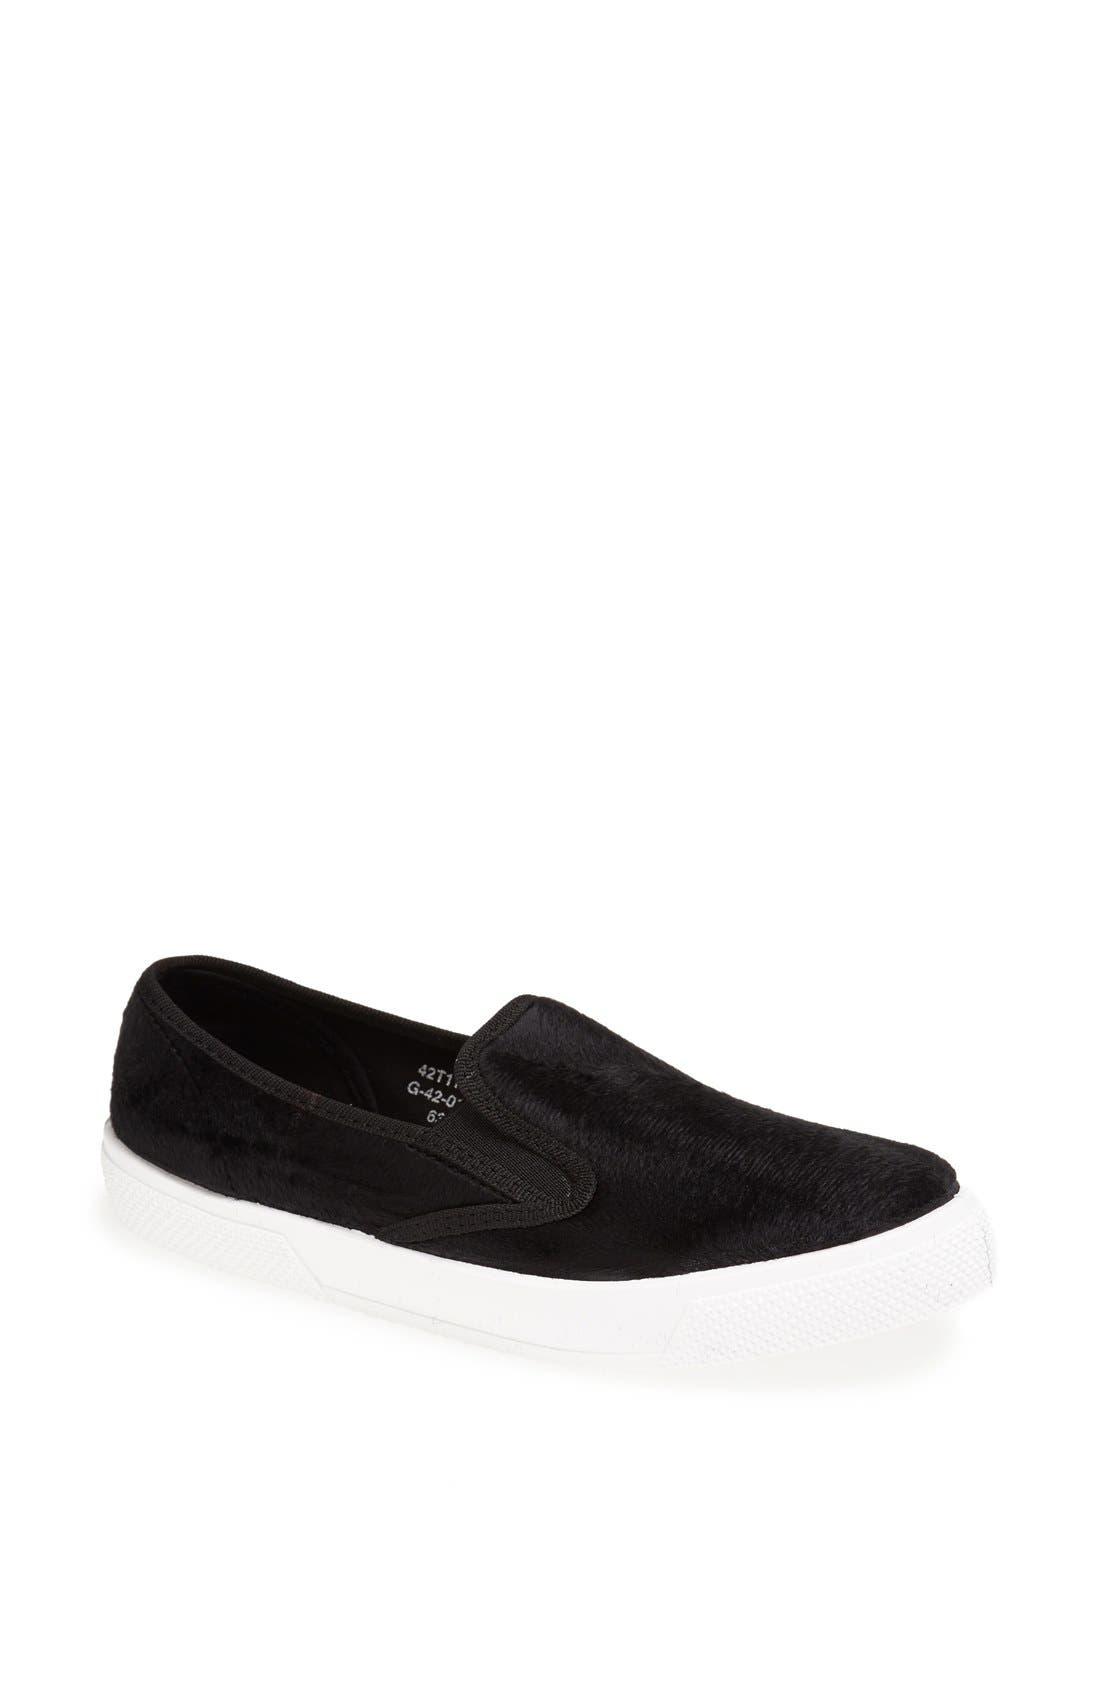 Alternate Image 1 Selected - Topshop 'Tika 2' Slip On Sneaker